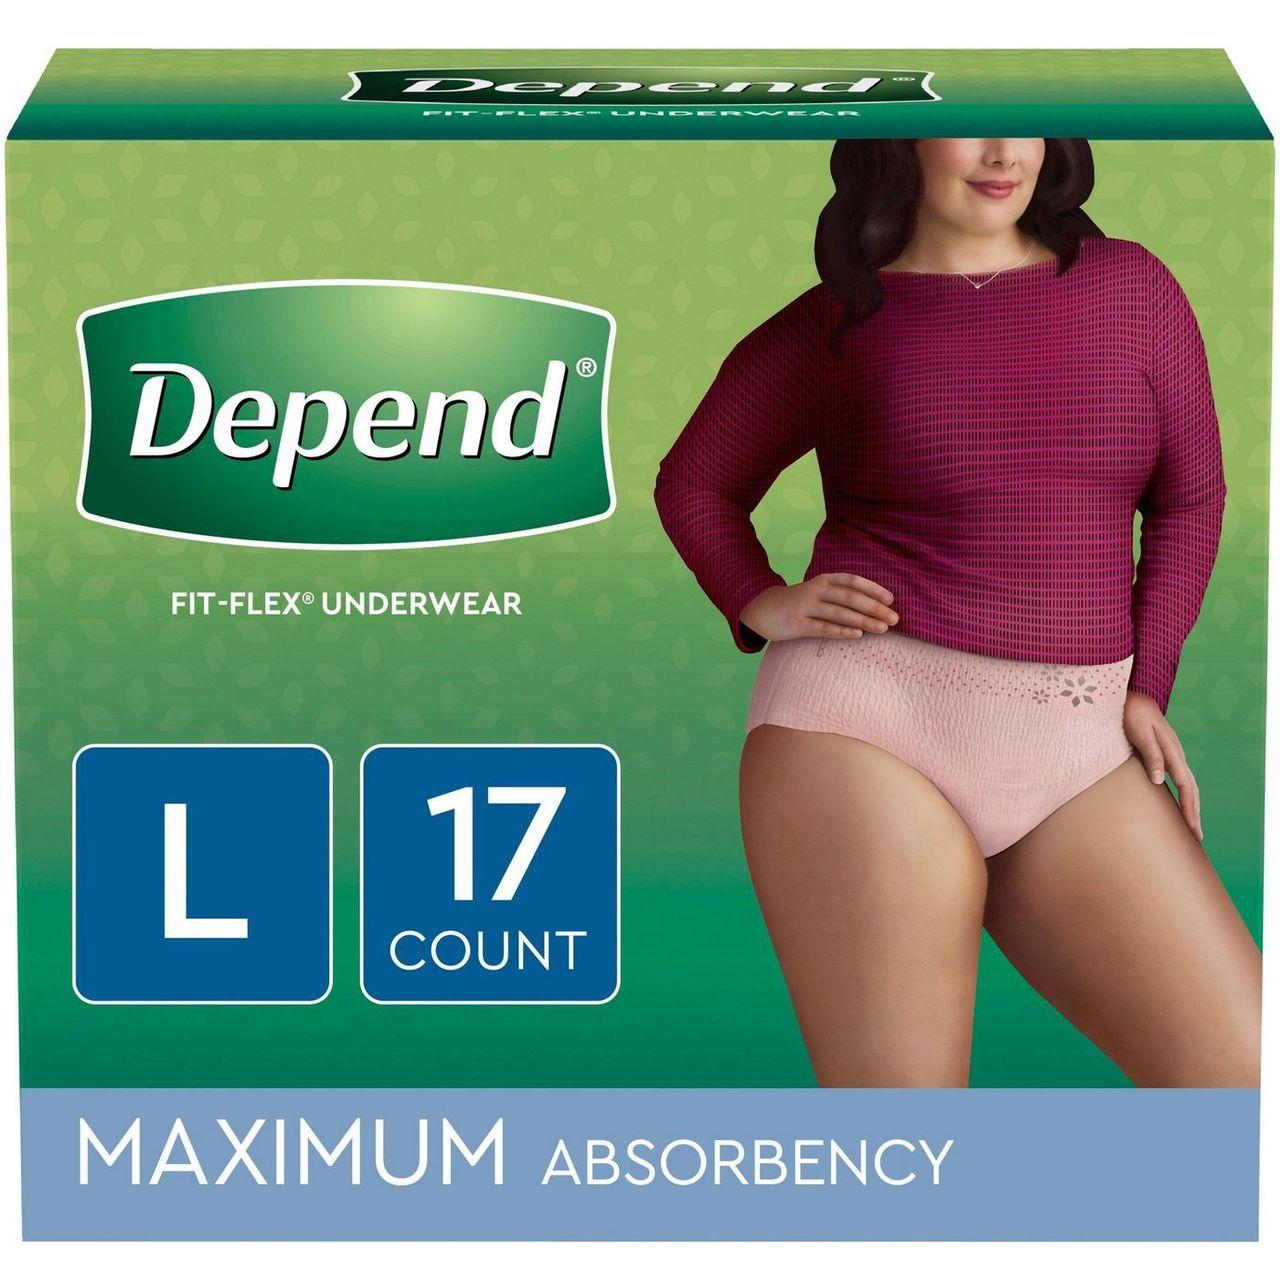 Depends for women